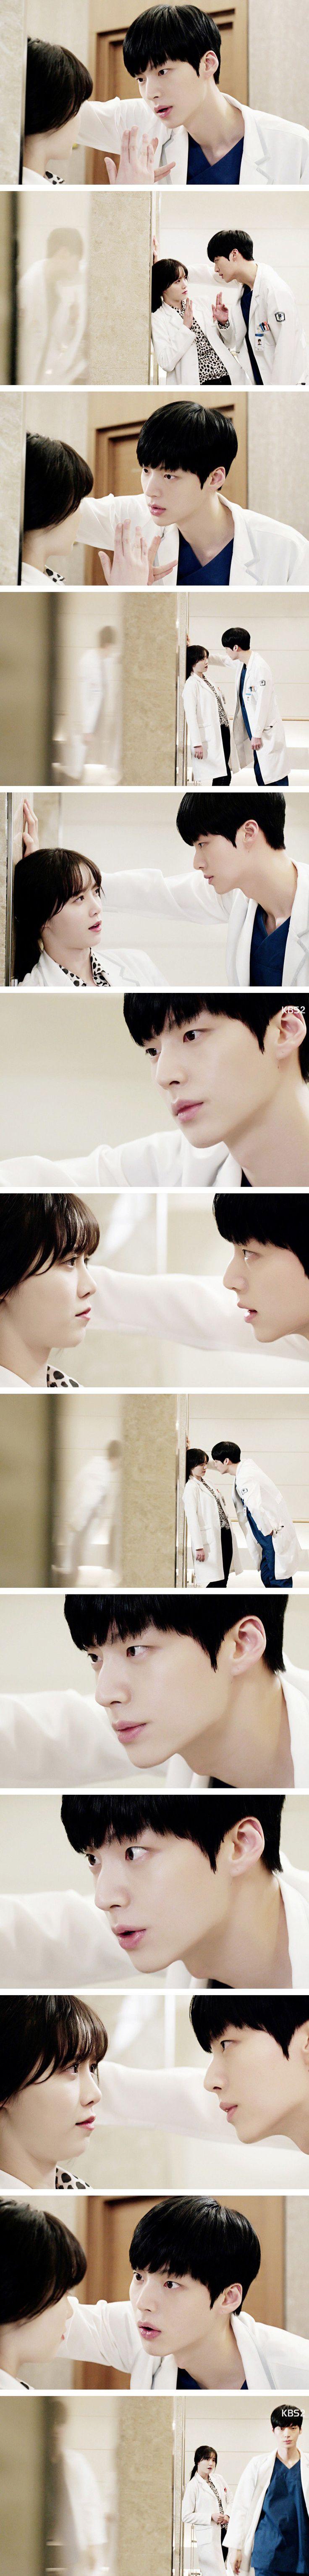 Blood (블러드) Korean - Drama - Episode 4 - Picture @ HanCinema :: The Korean Movie and Drama Database